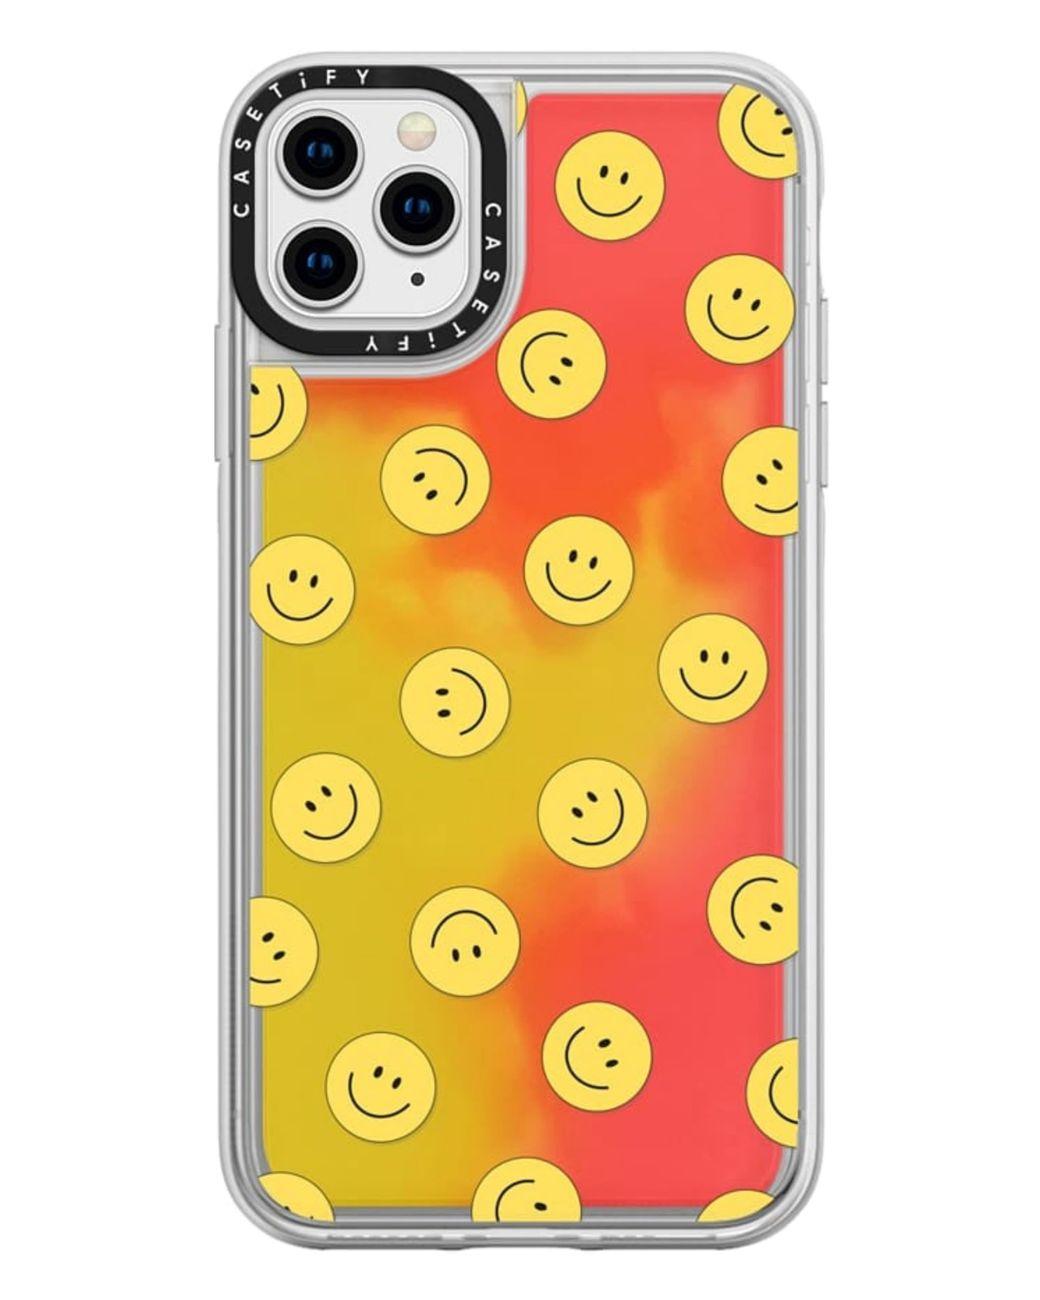 Flame Princess 2 iPhone 11 case